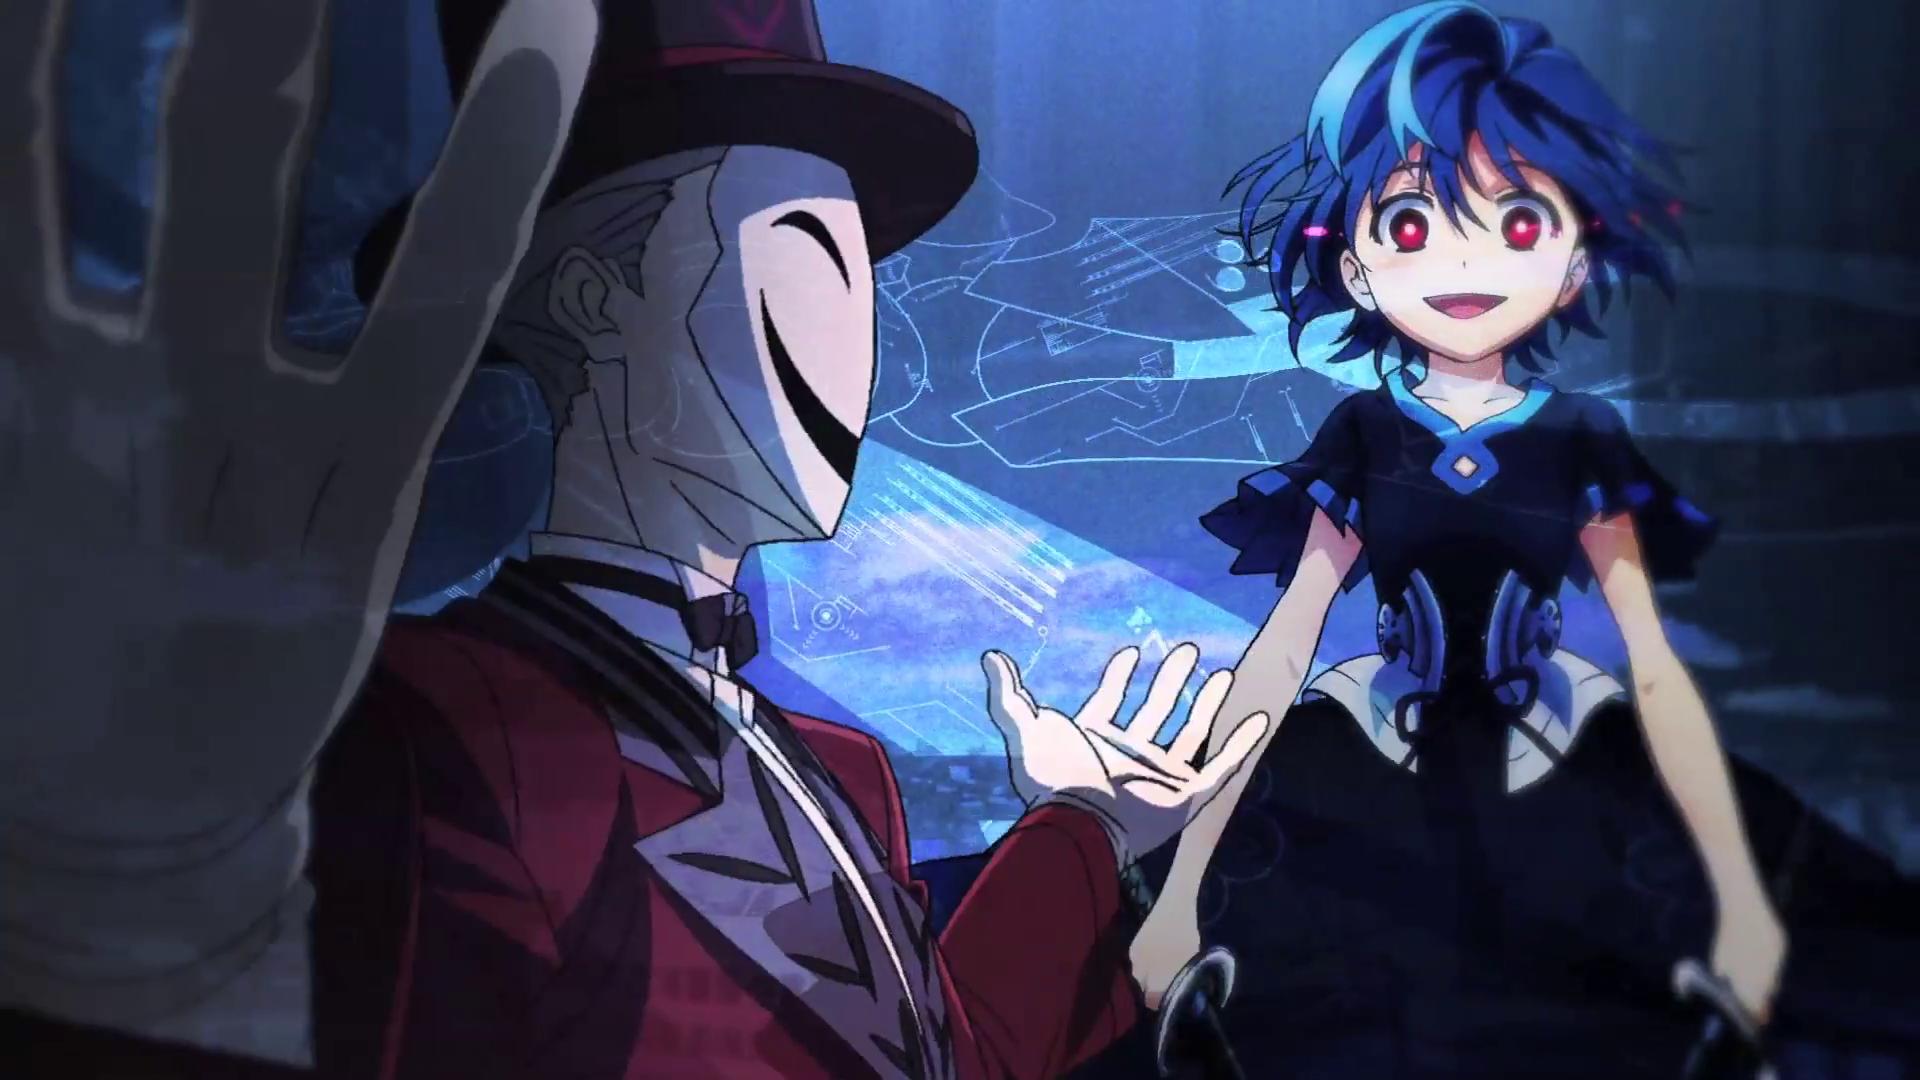 Black Bullet Episode 1 First Impressions   AnimeMagecom 1920x1080